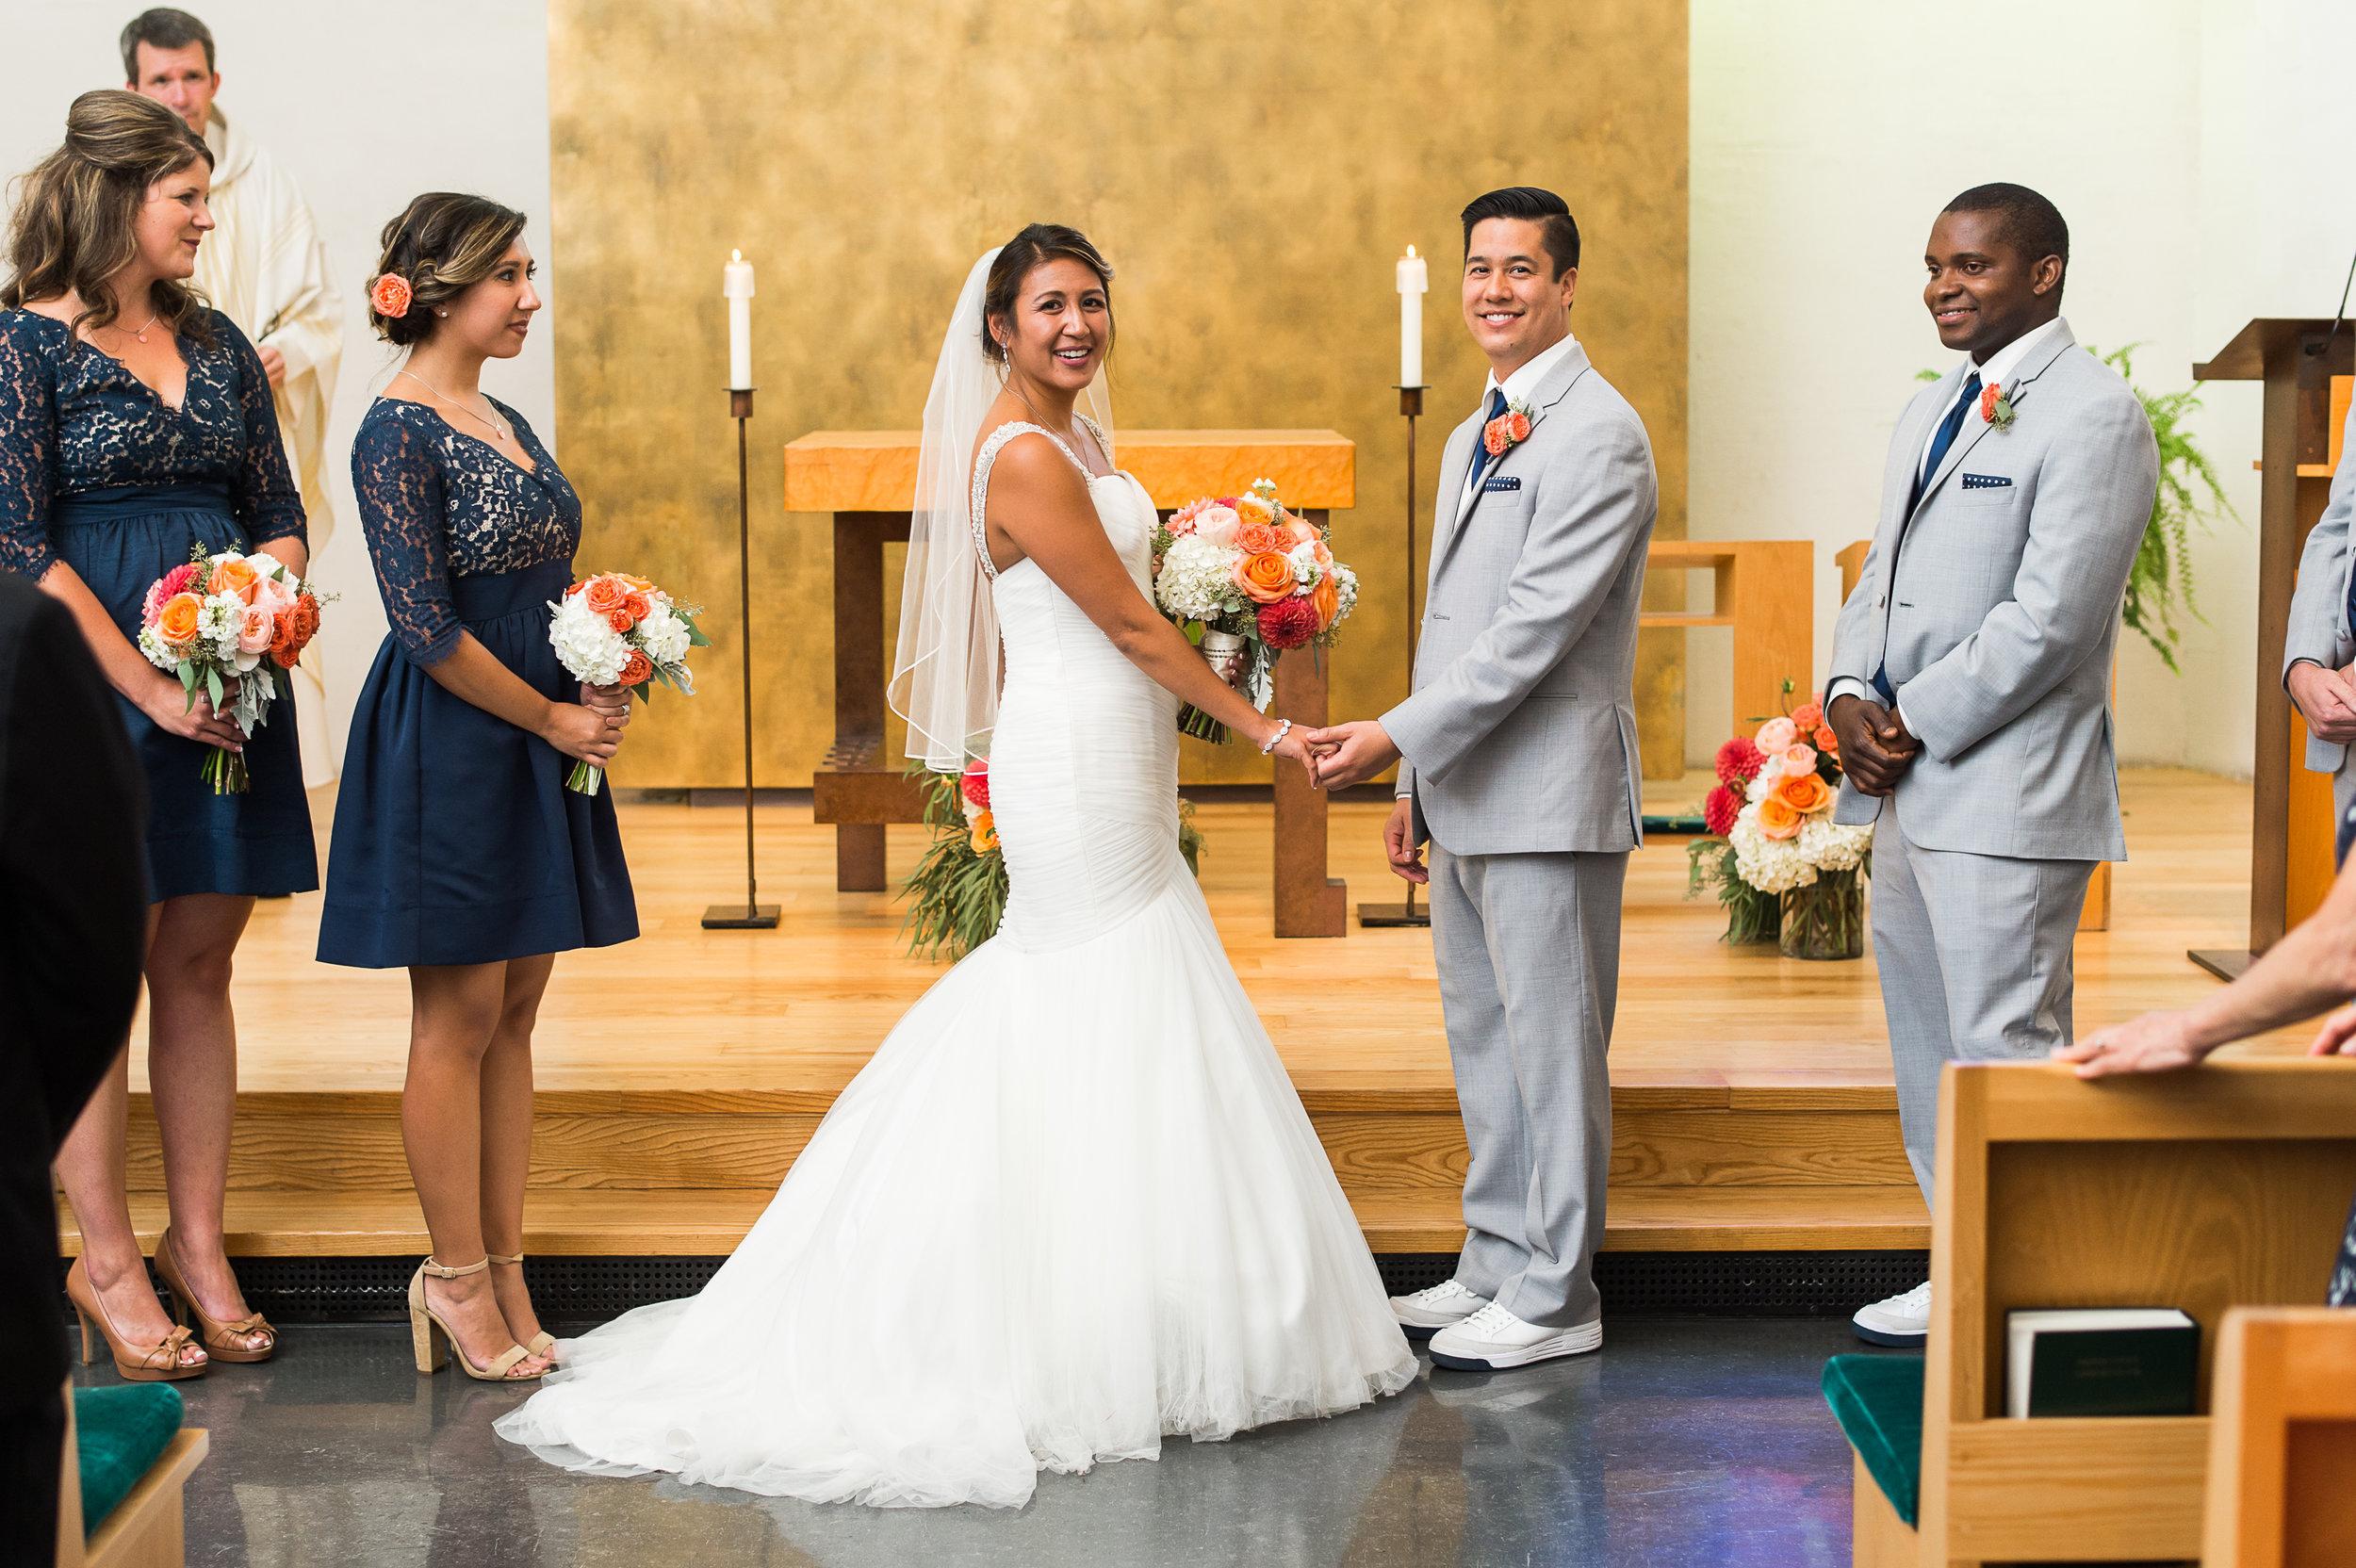 DJ-wedding-Van-Wyhe-Photography-367.jpg